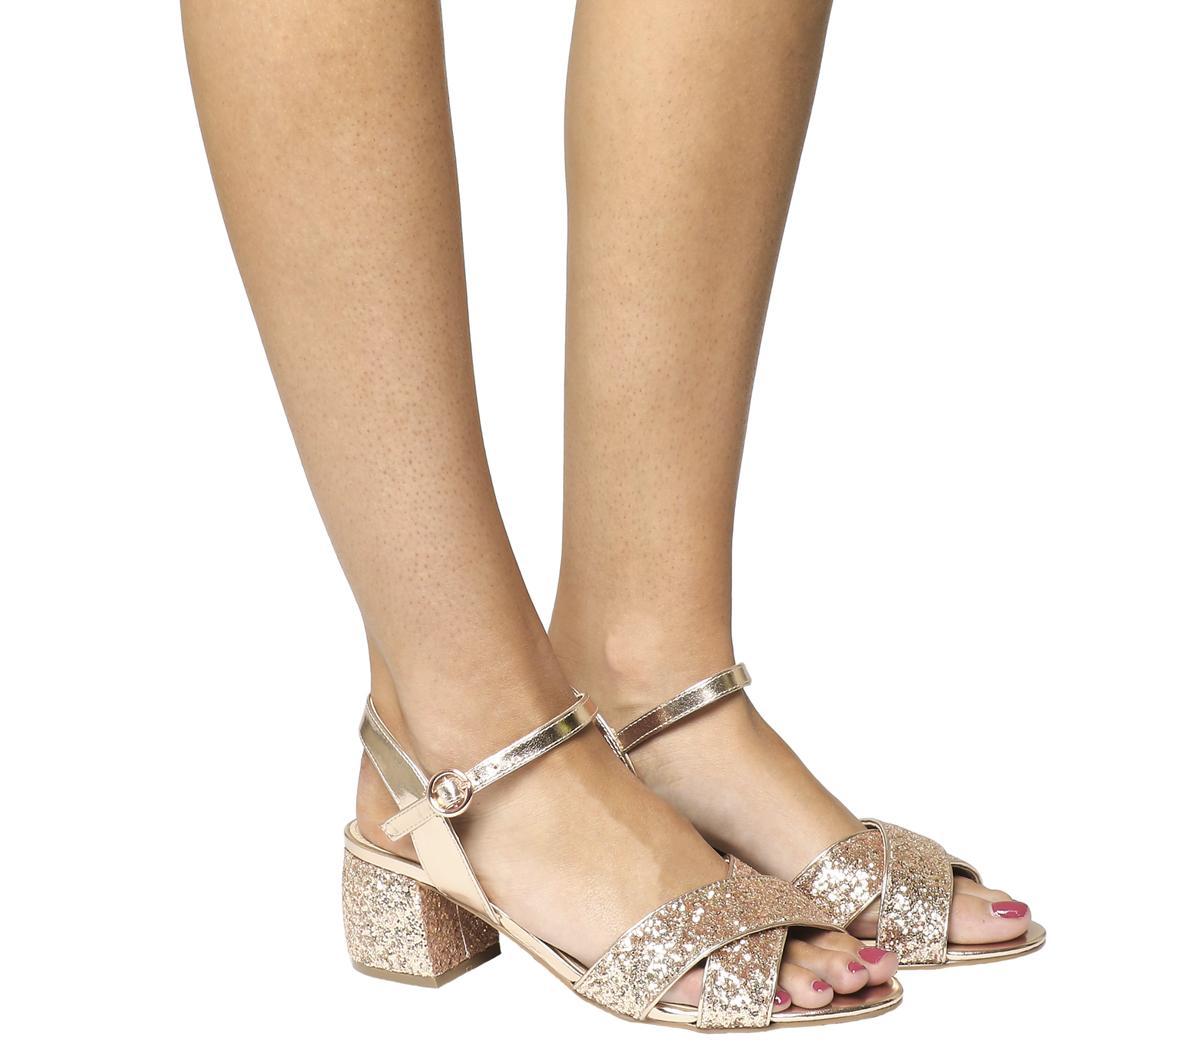 b35837788622 Merlot Block Heel Sandals. Double tap to zoom into the image. Office ...